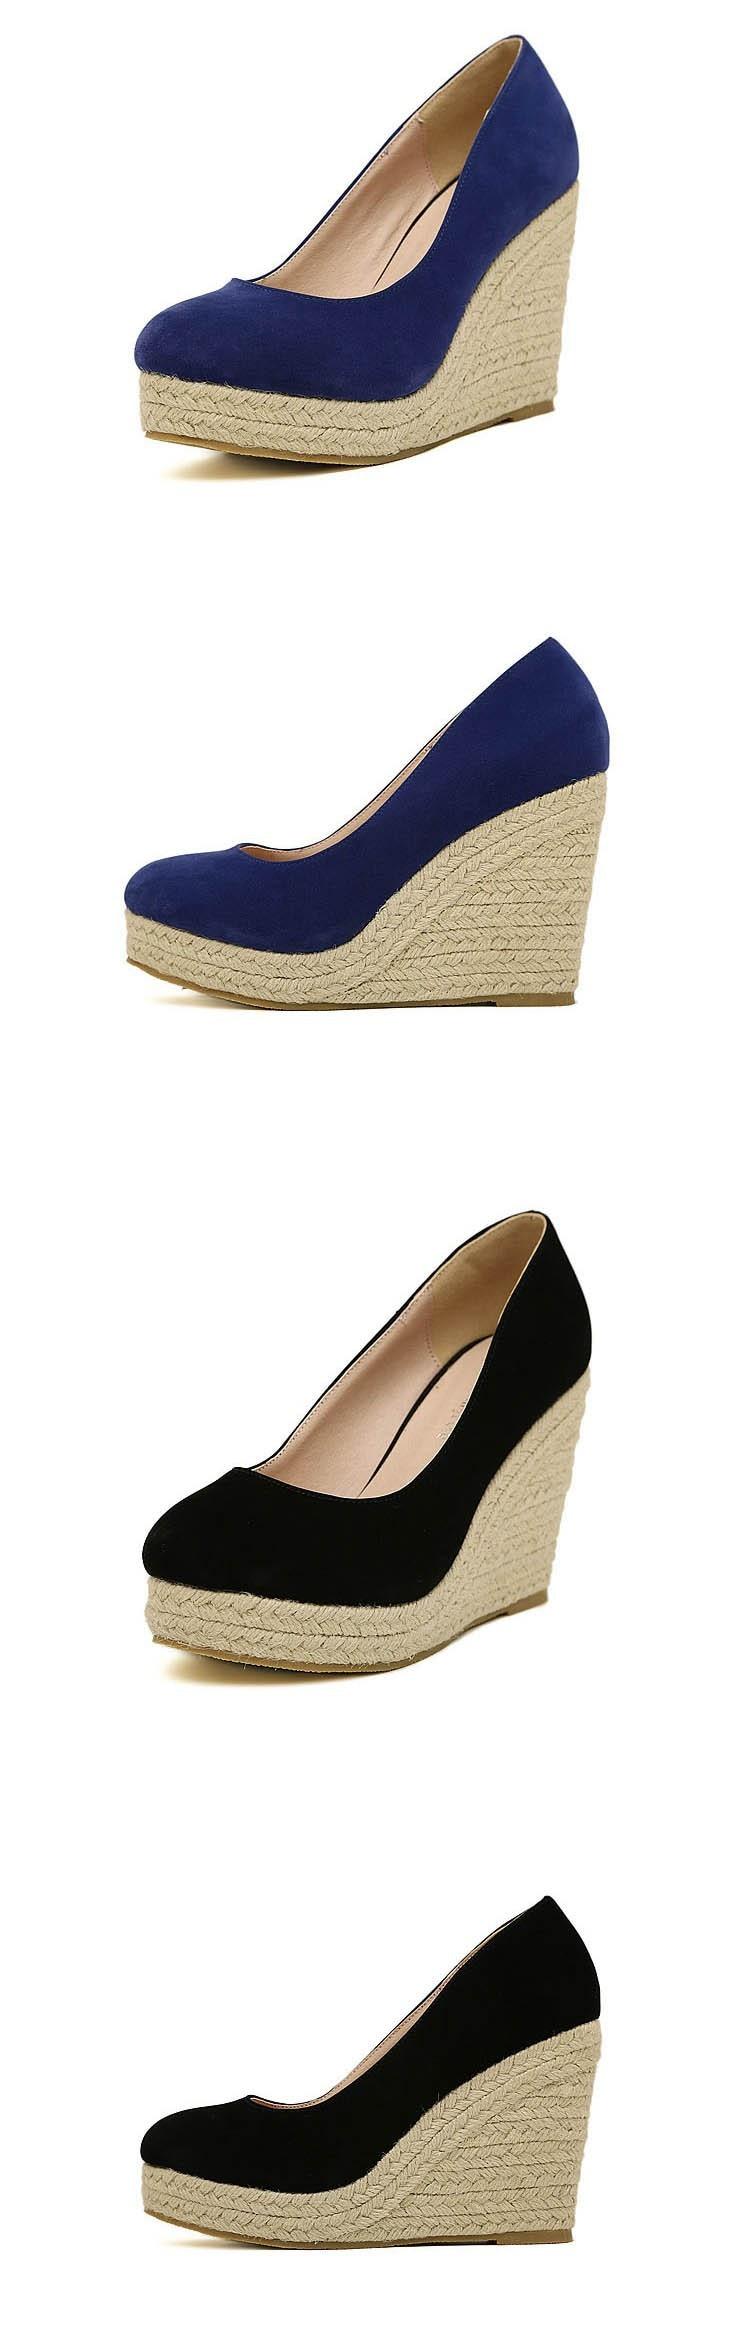 1c5ec38c8c1 ... Toe Women Pumps Fashion Mary Jane High Heels Wedding Shoes Free  Shipping Russia. US  32.88 piece